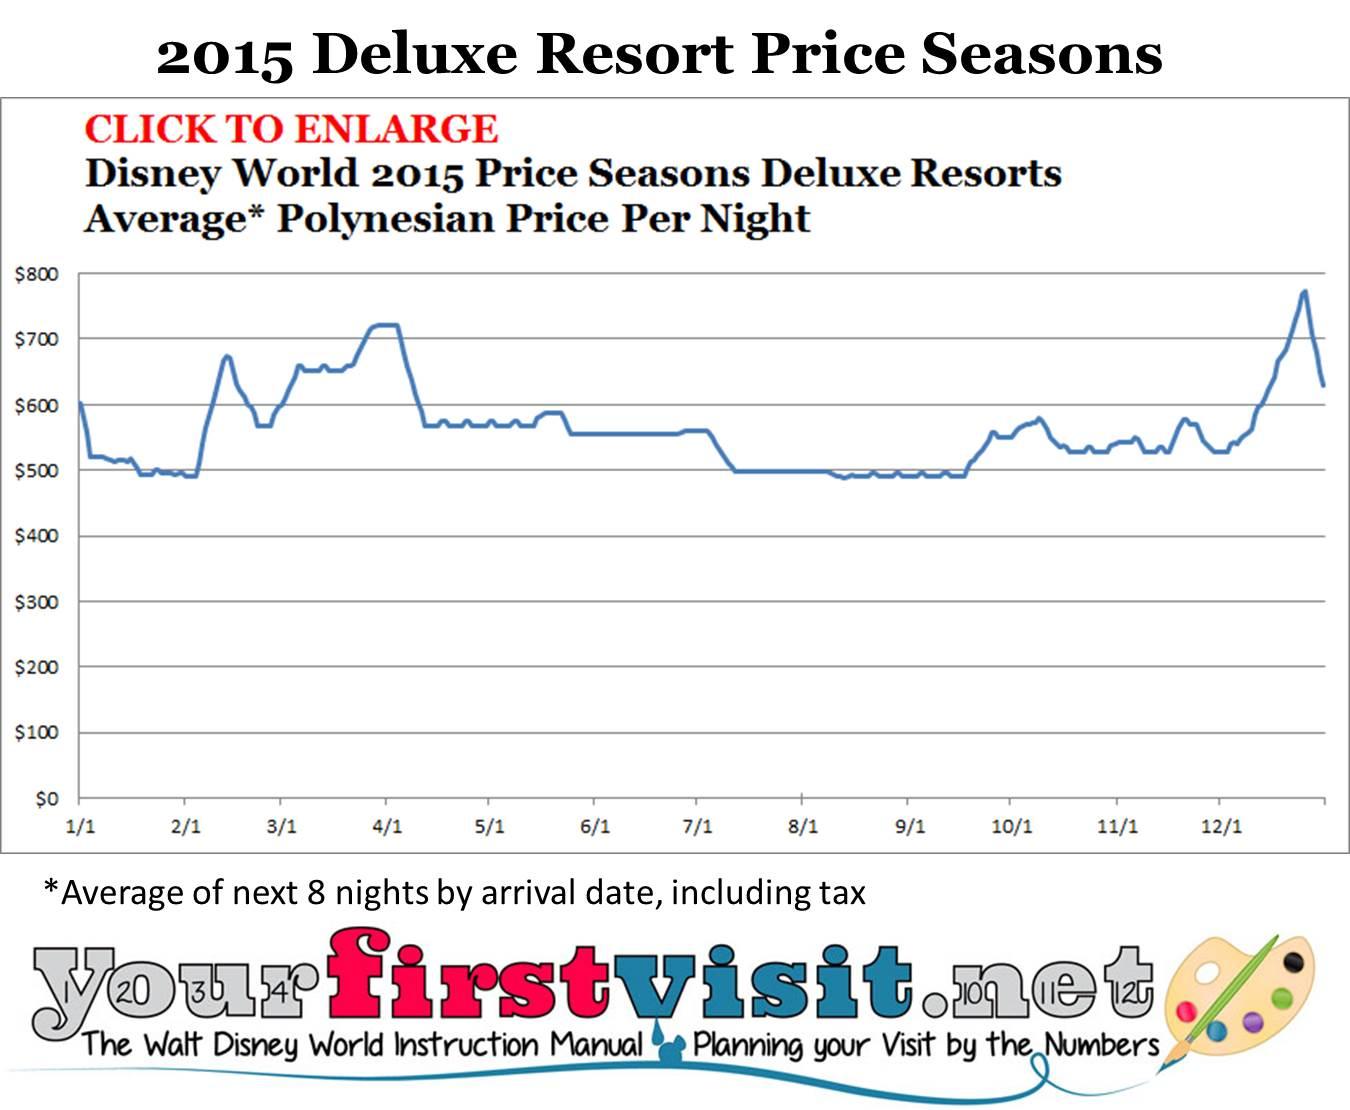 Disney World 2015 Deluxe Resort Price Seasons from yourfirstvisit.net